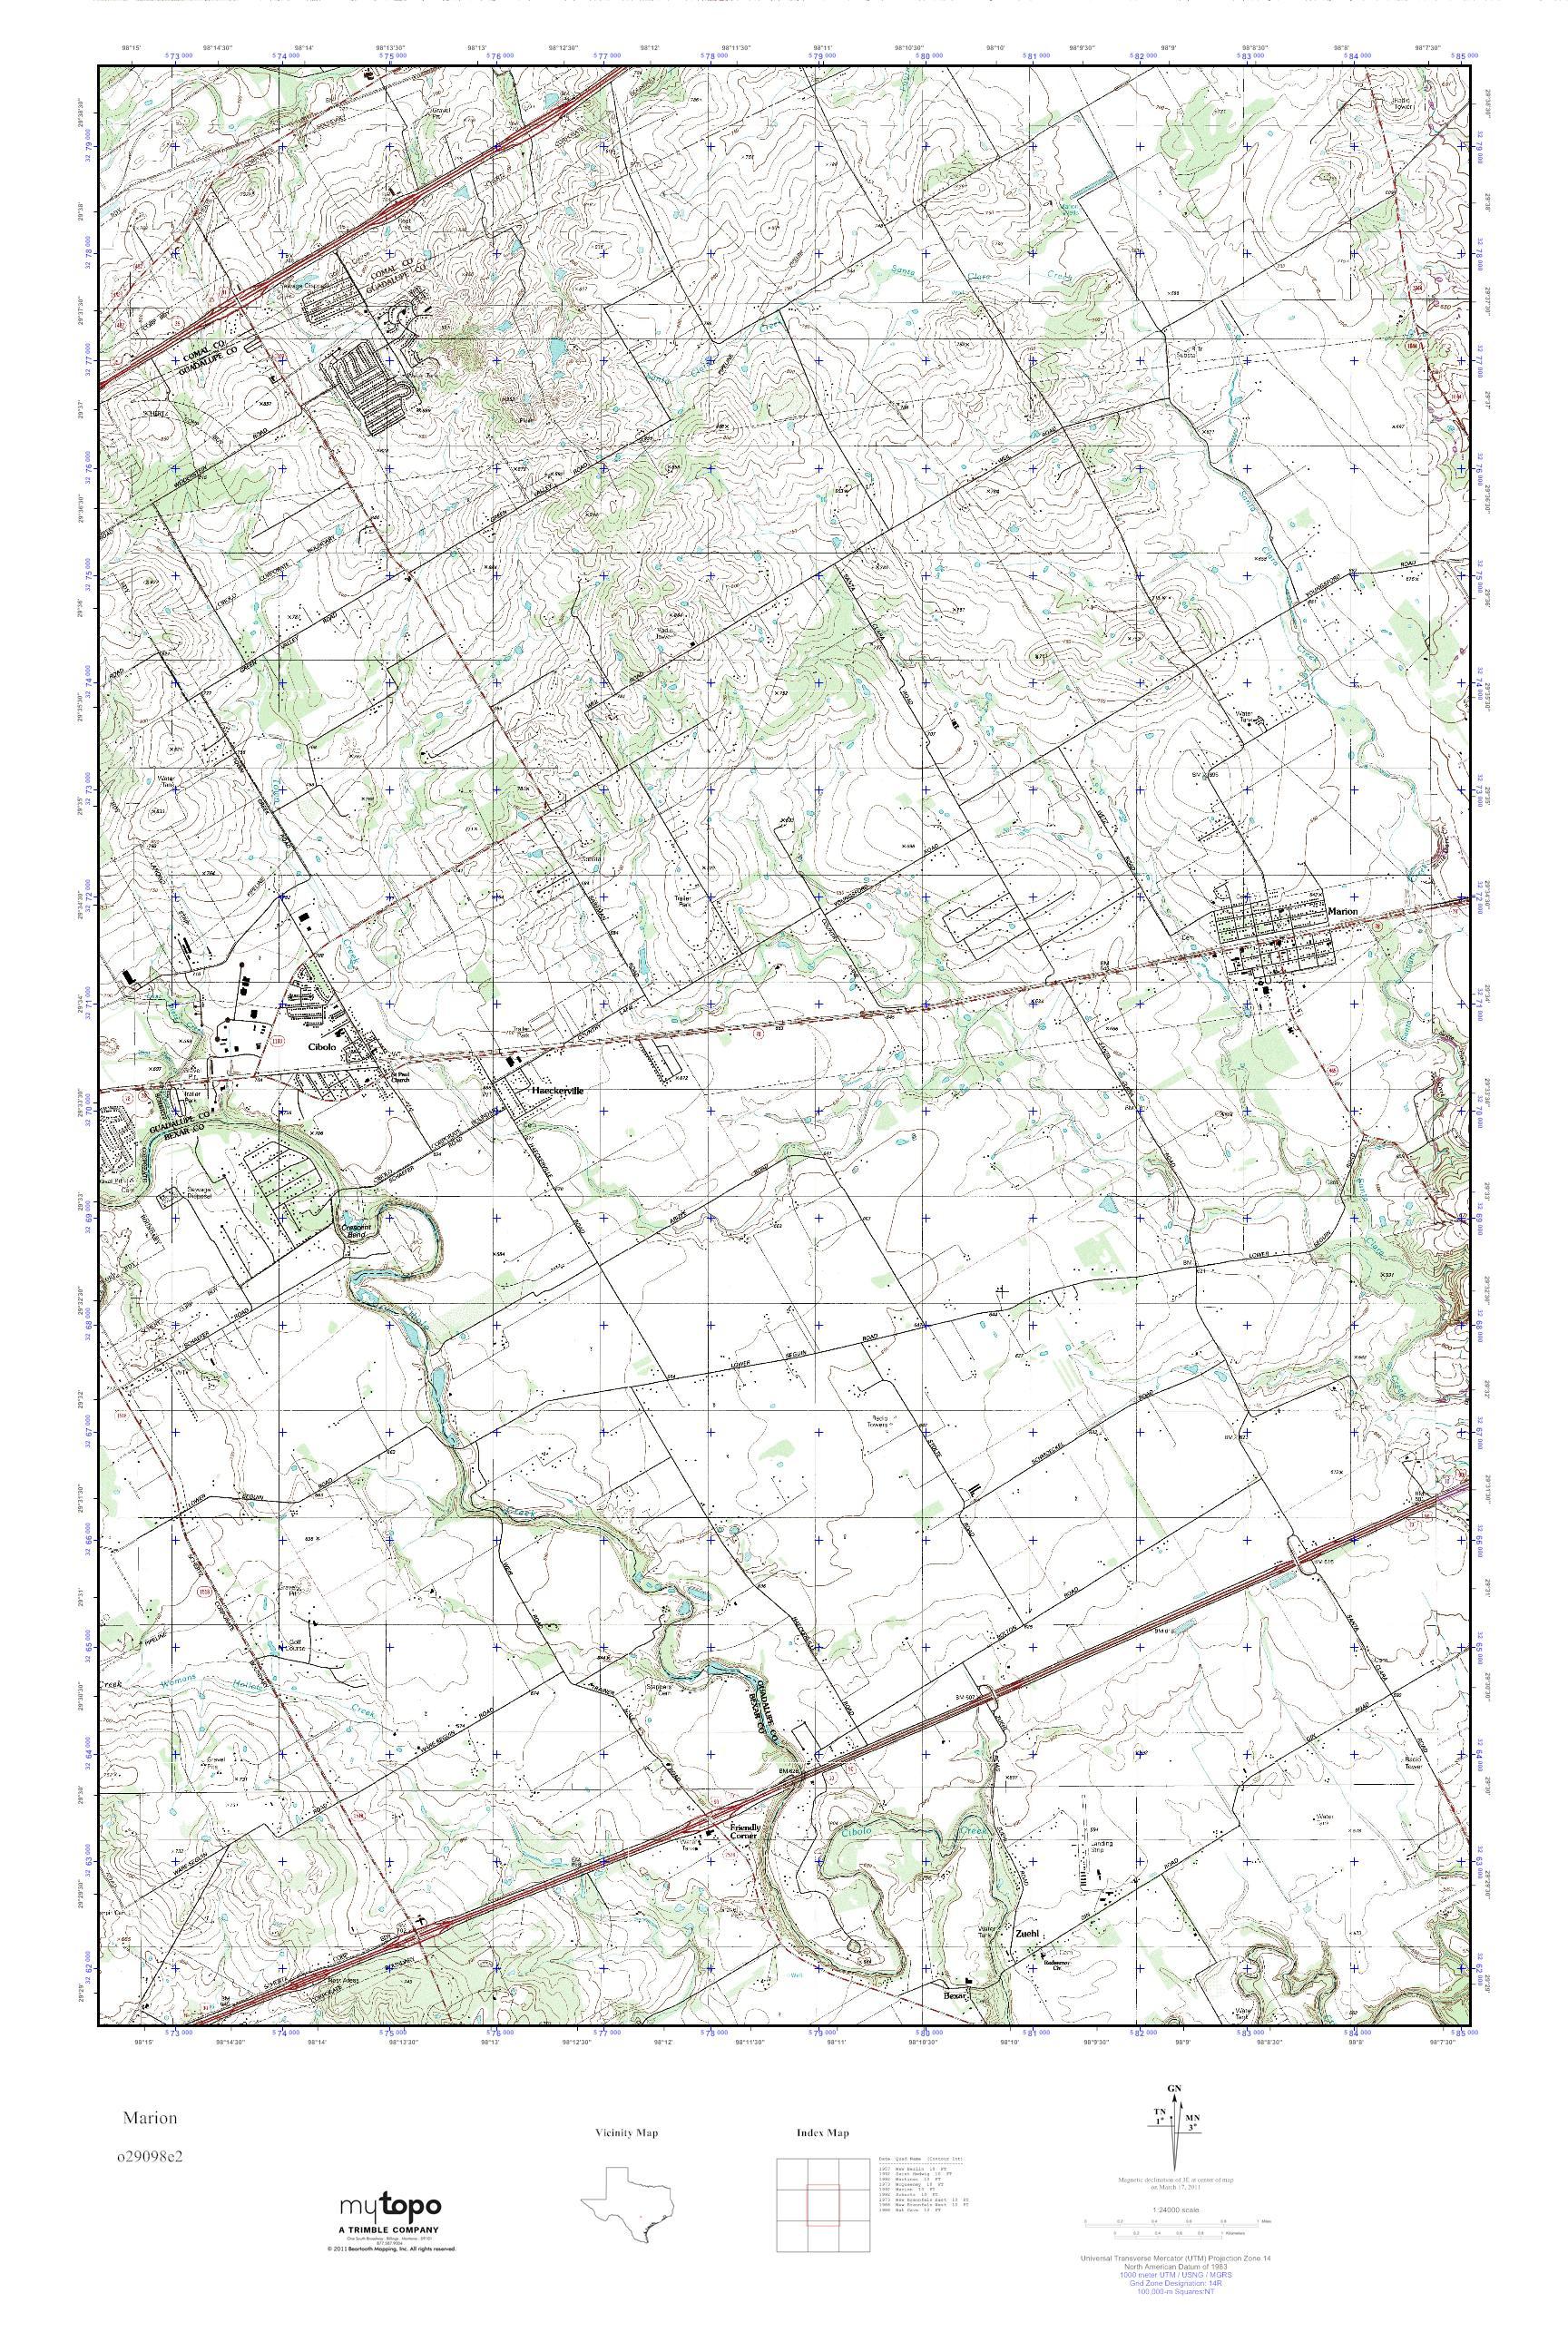 Mytopo Marion, Texas Usgs Quad Topo Map - Marion Texas Map